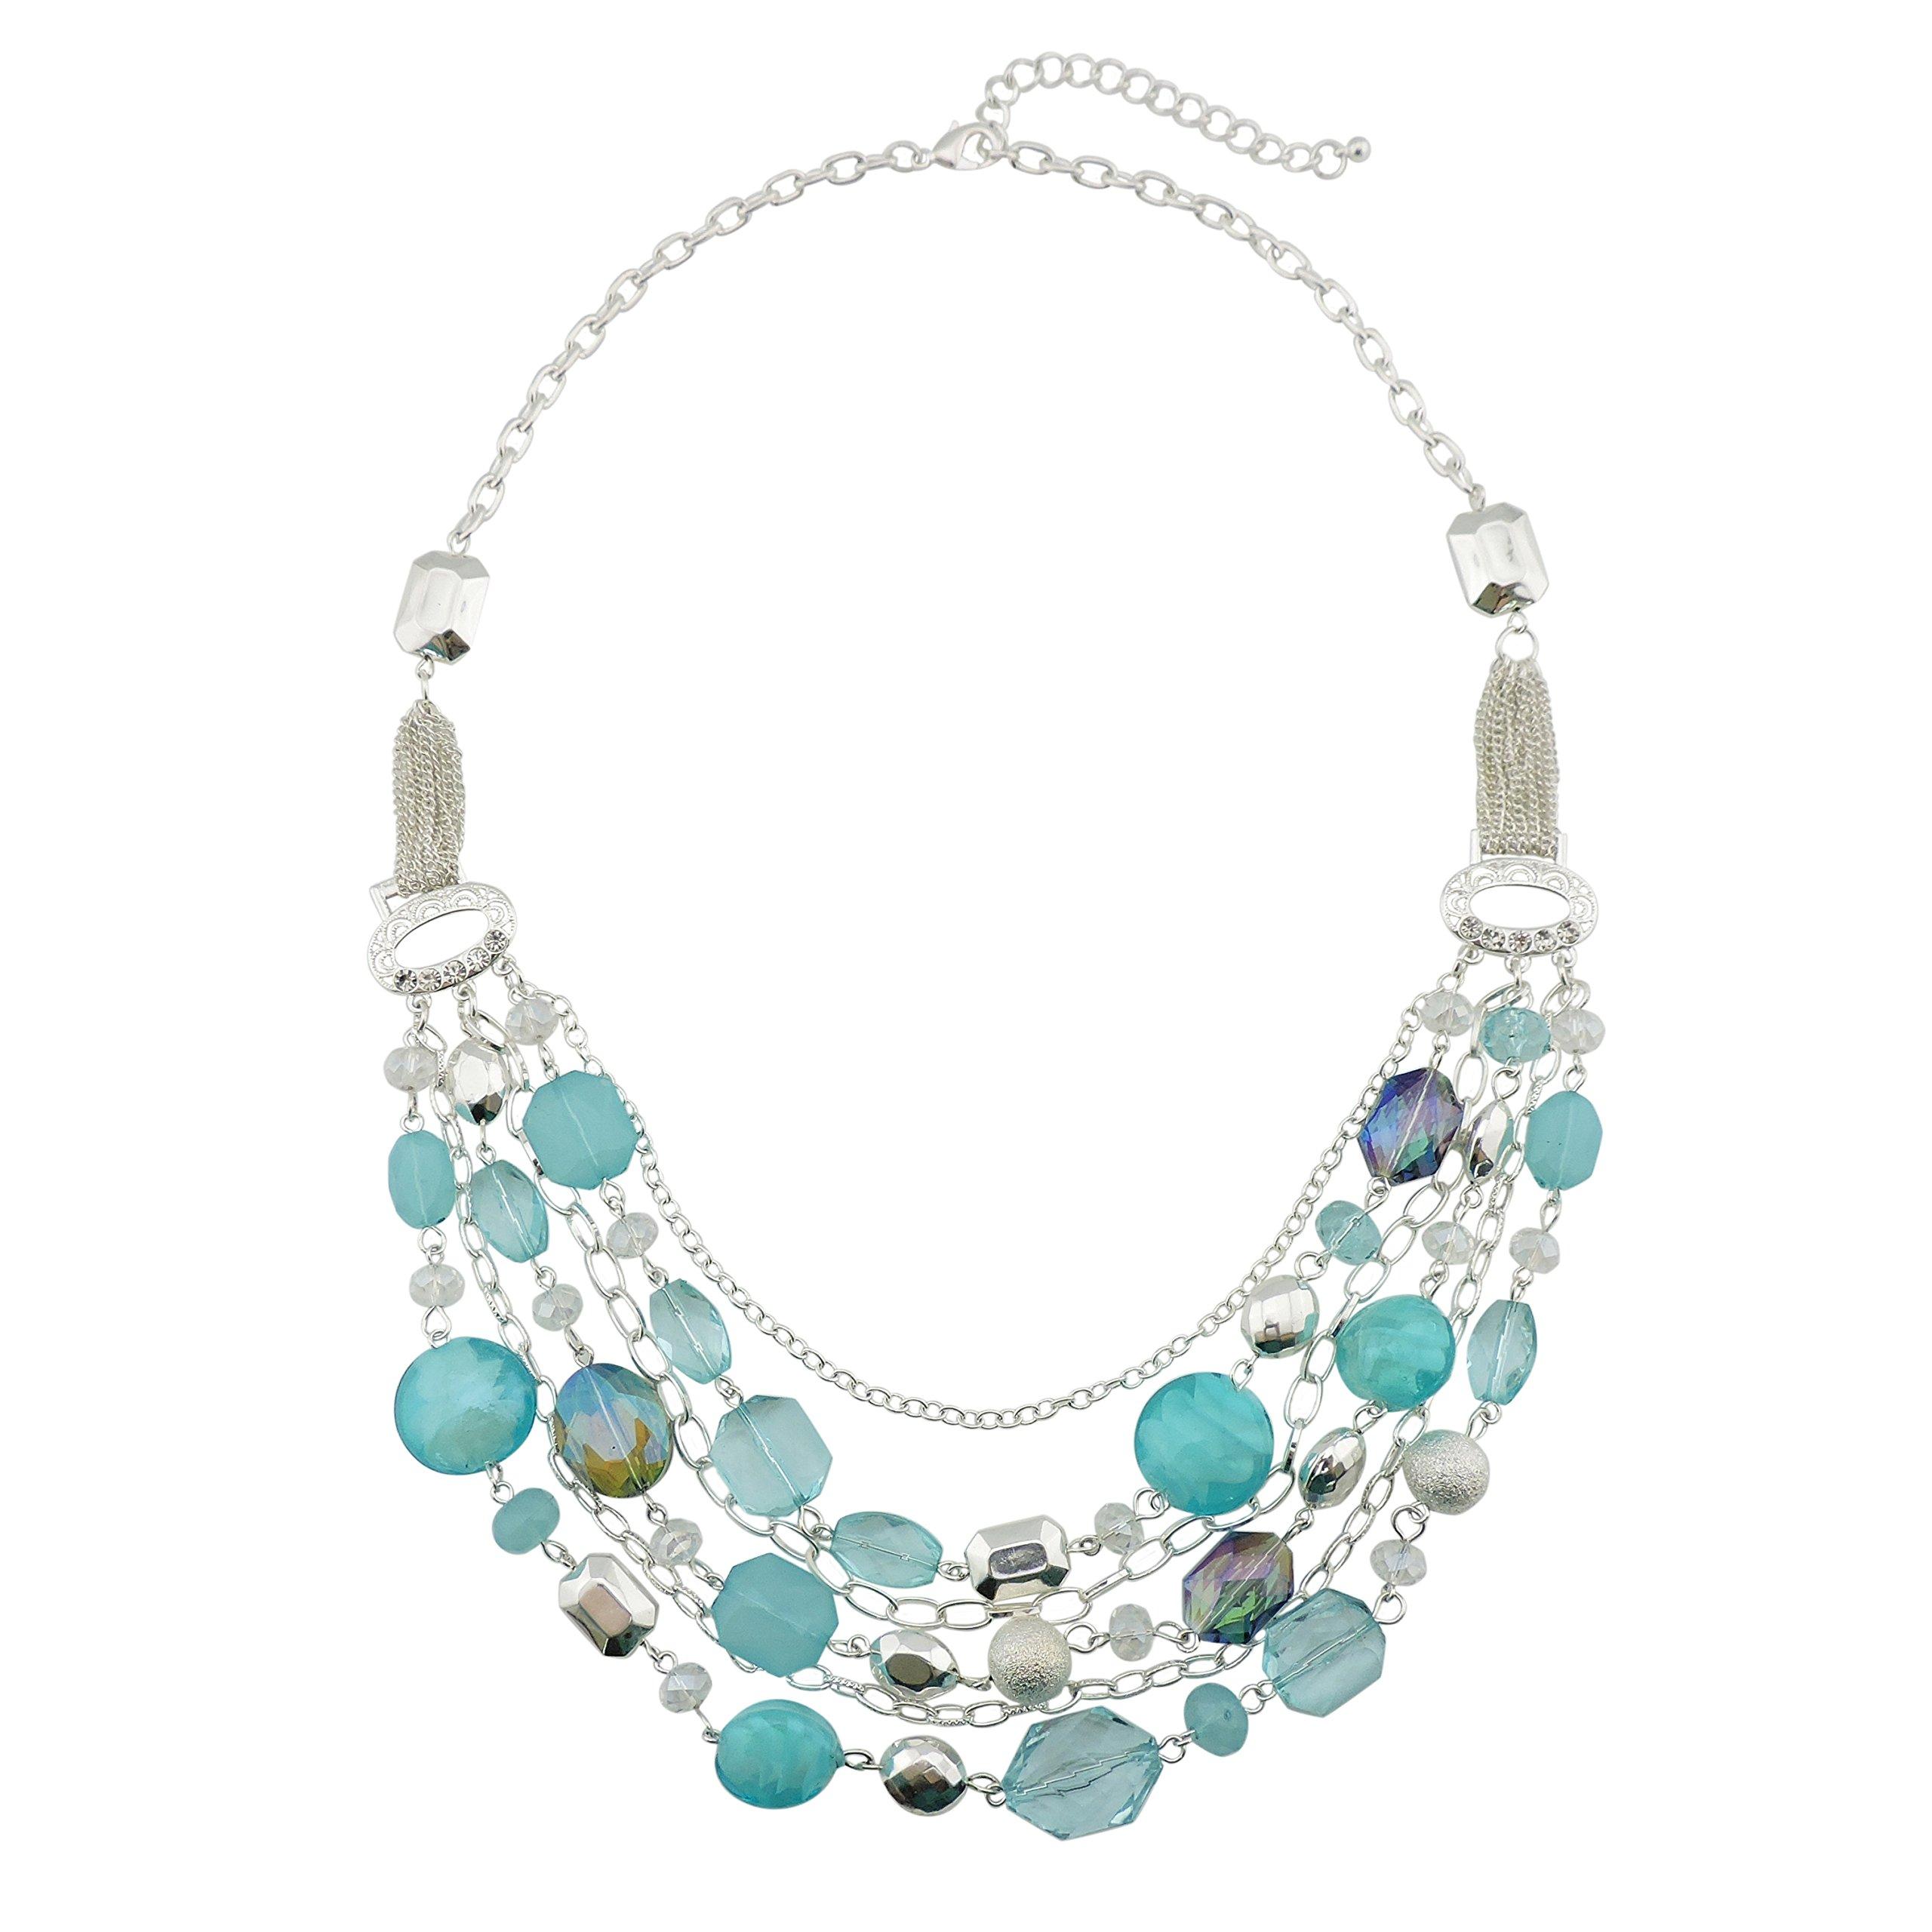 Bocar Newest Multi Layer Chain Crystal Colored Glaze Statement Women Necklace (NK-10061-Aquamarine)